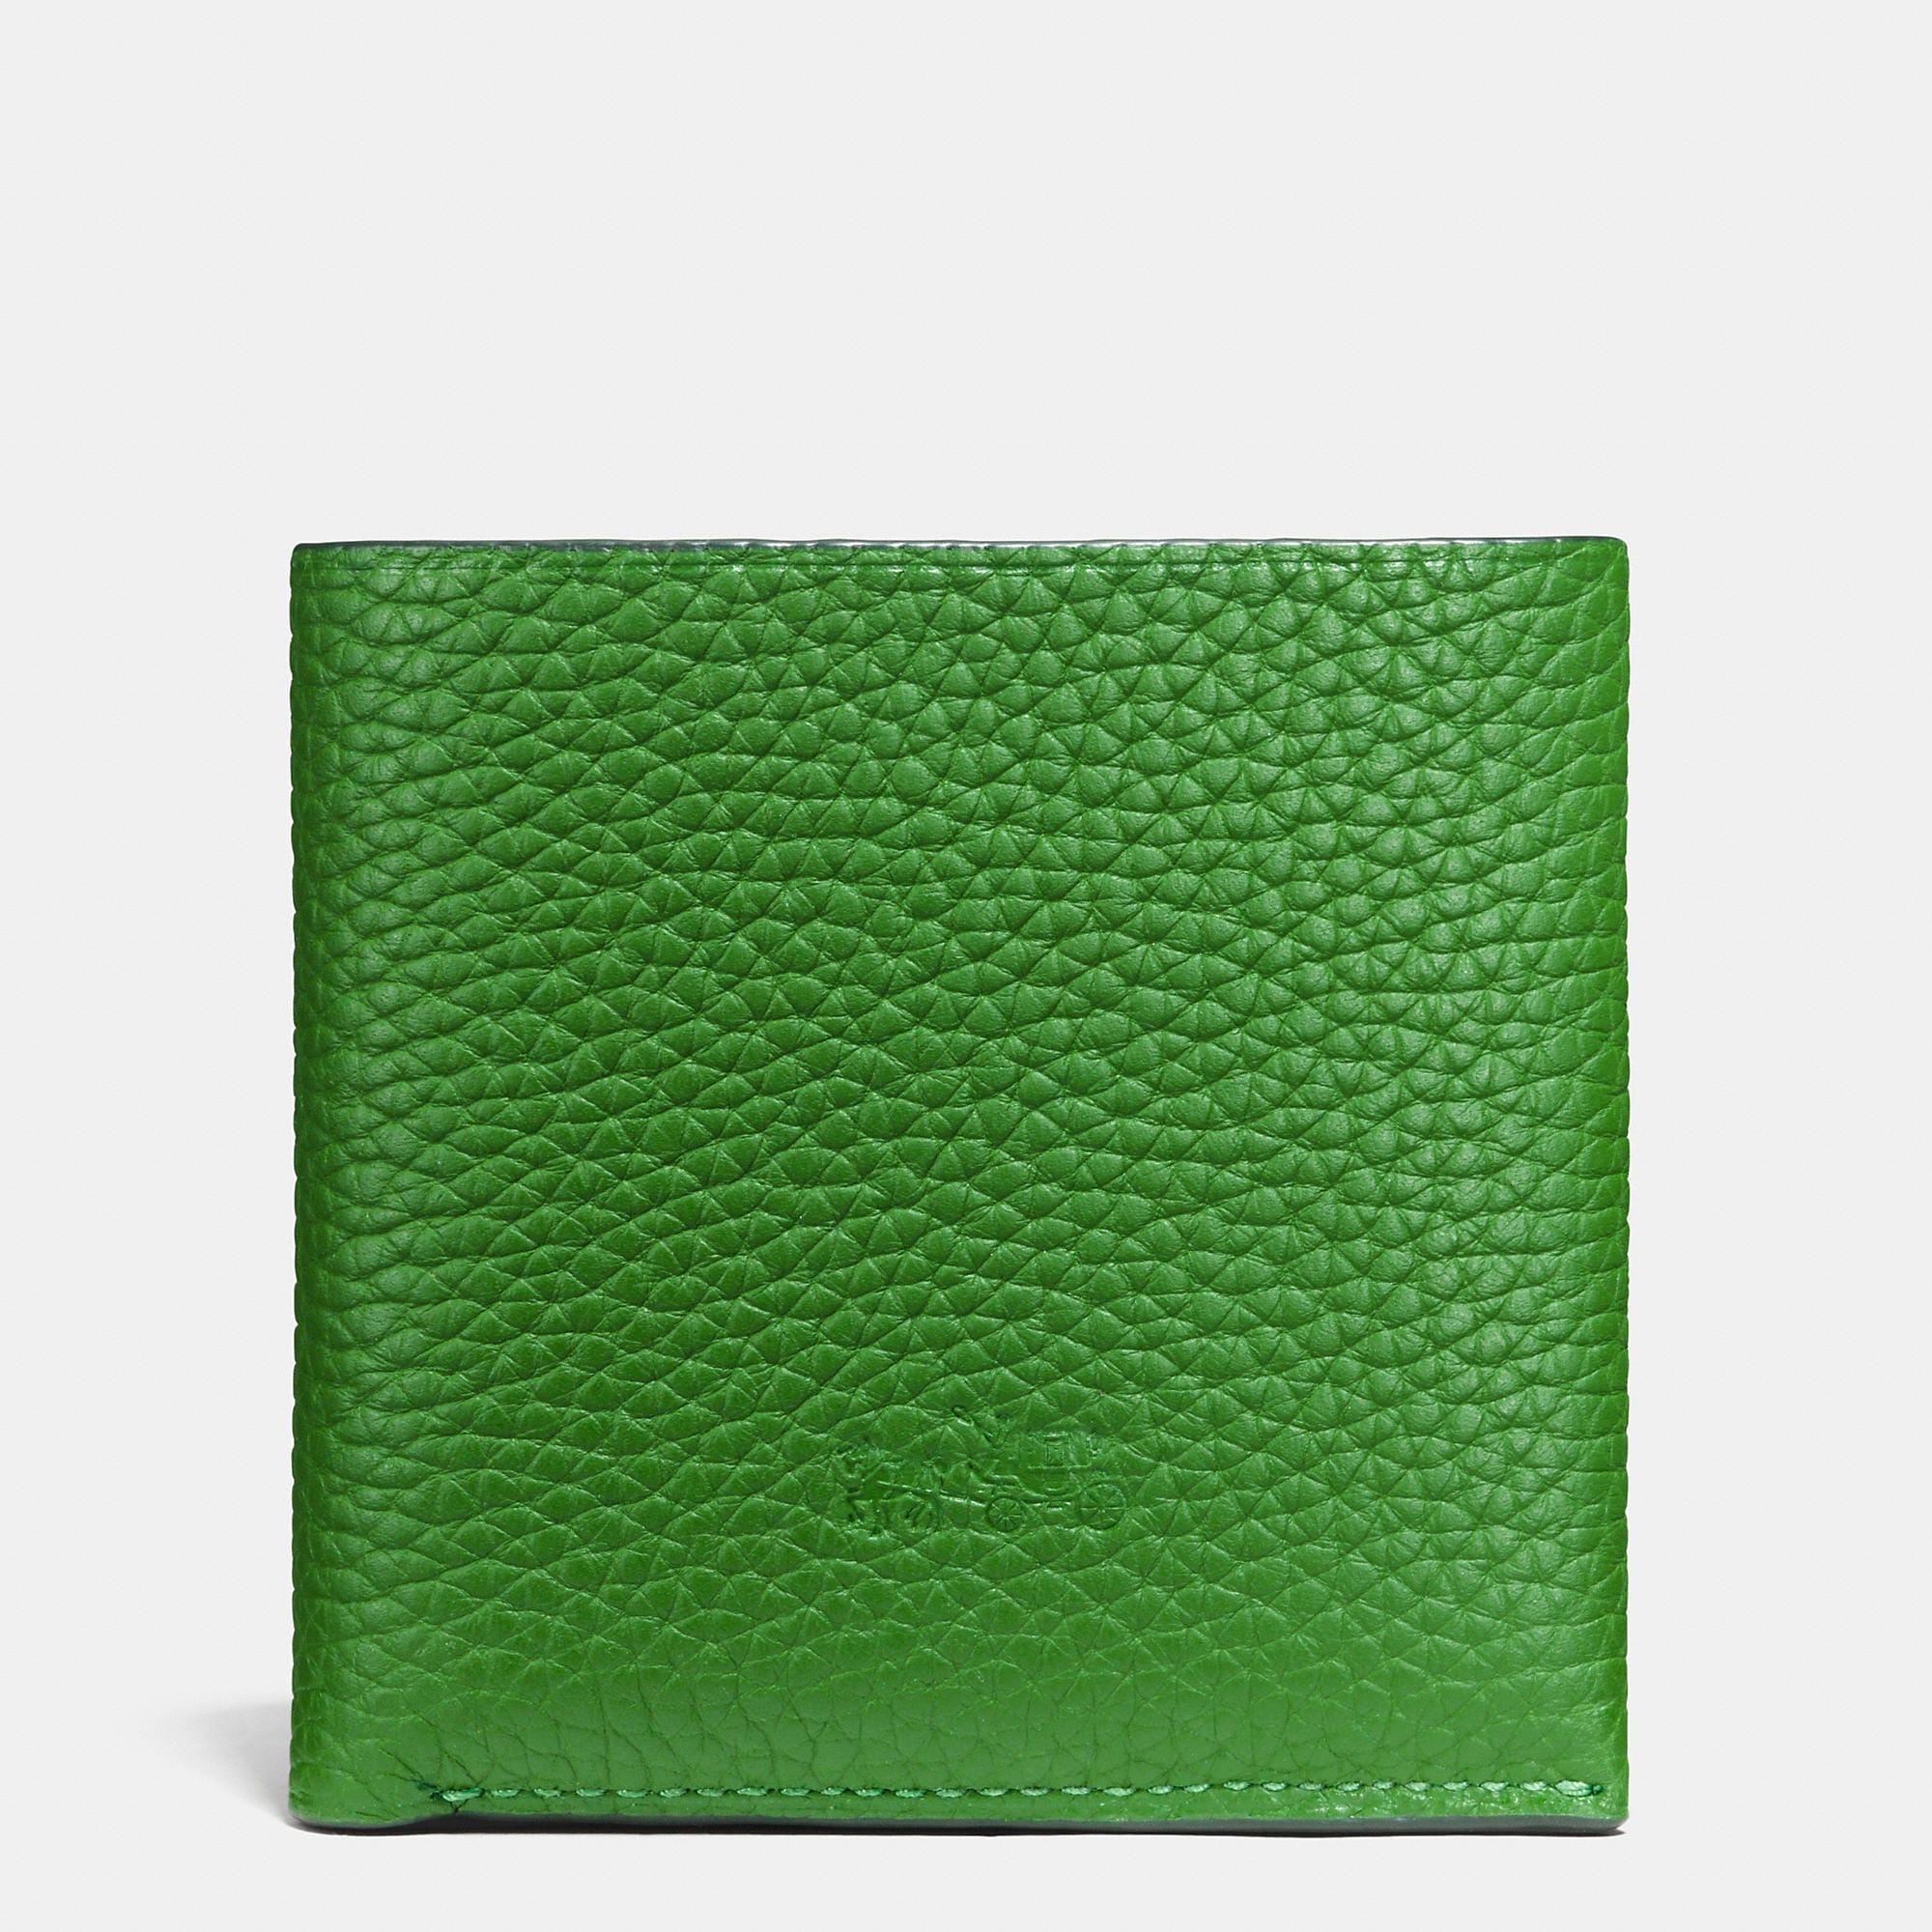 Coach Billfold Wallet In Pebble Leather